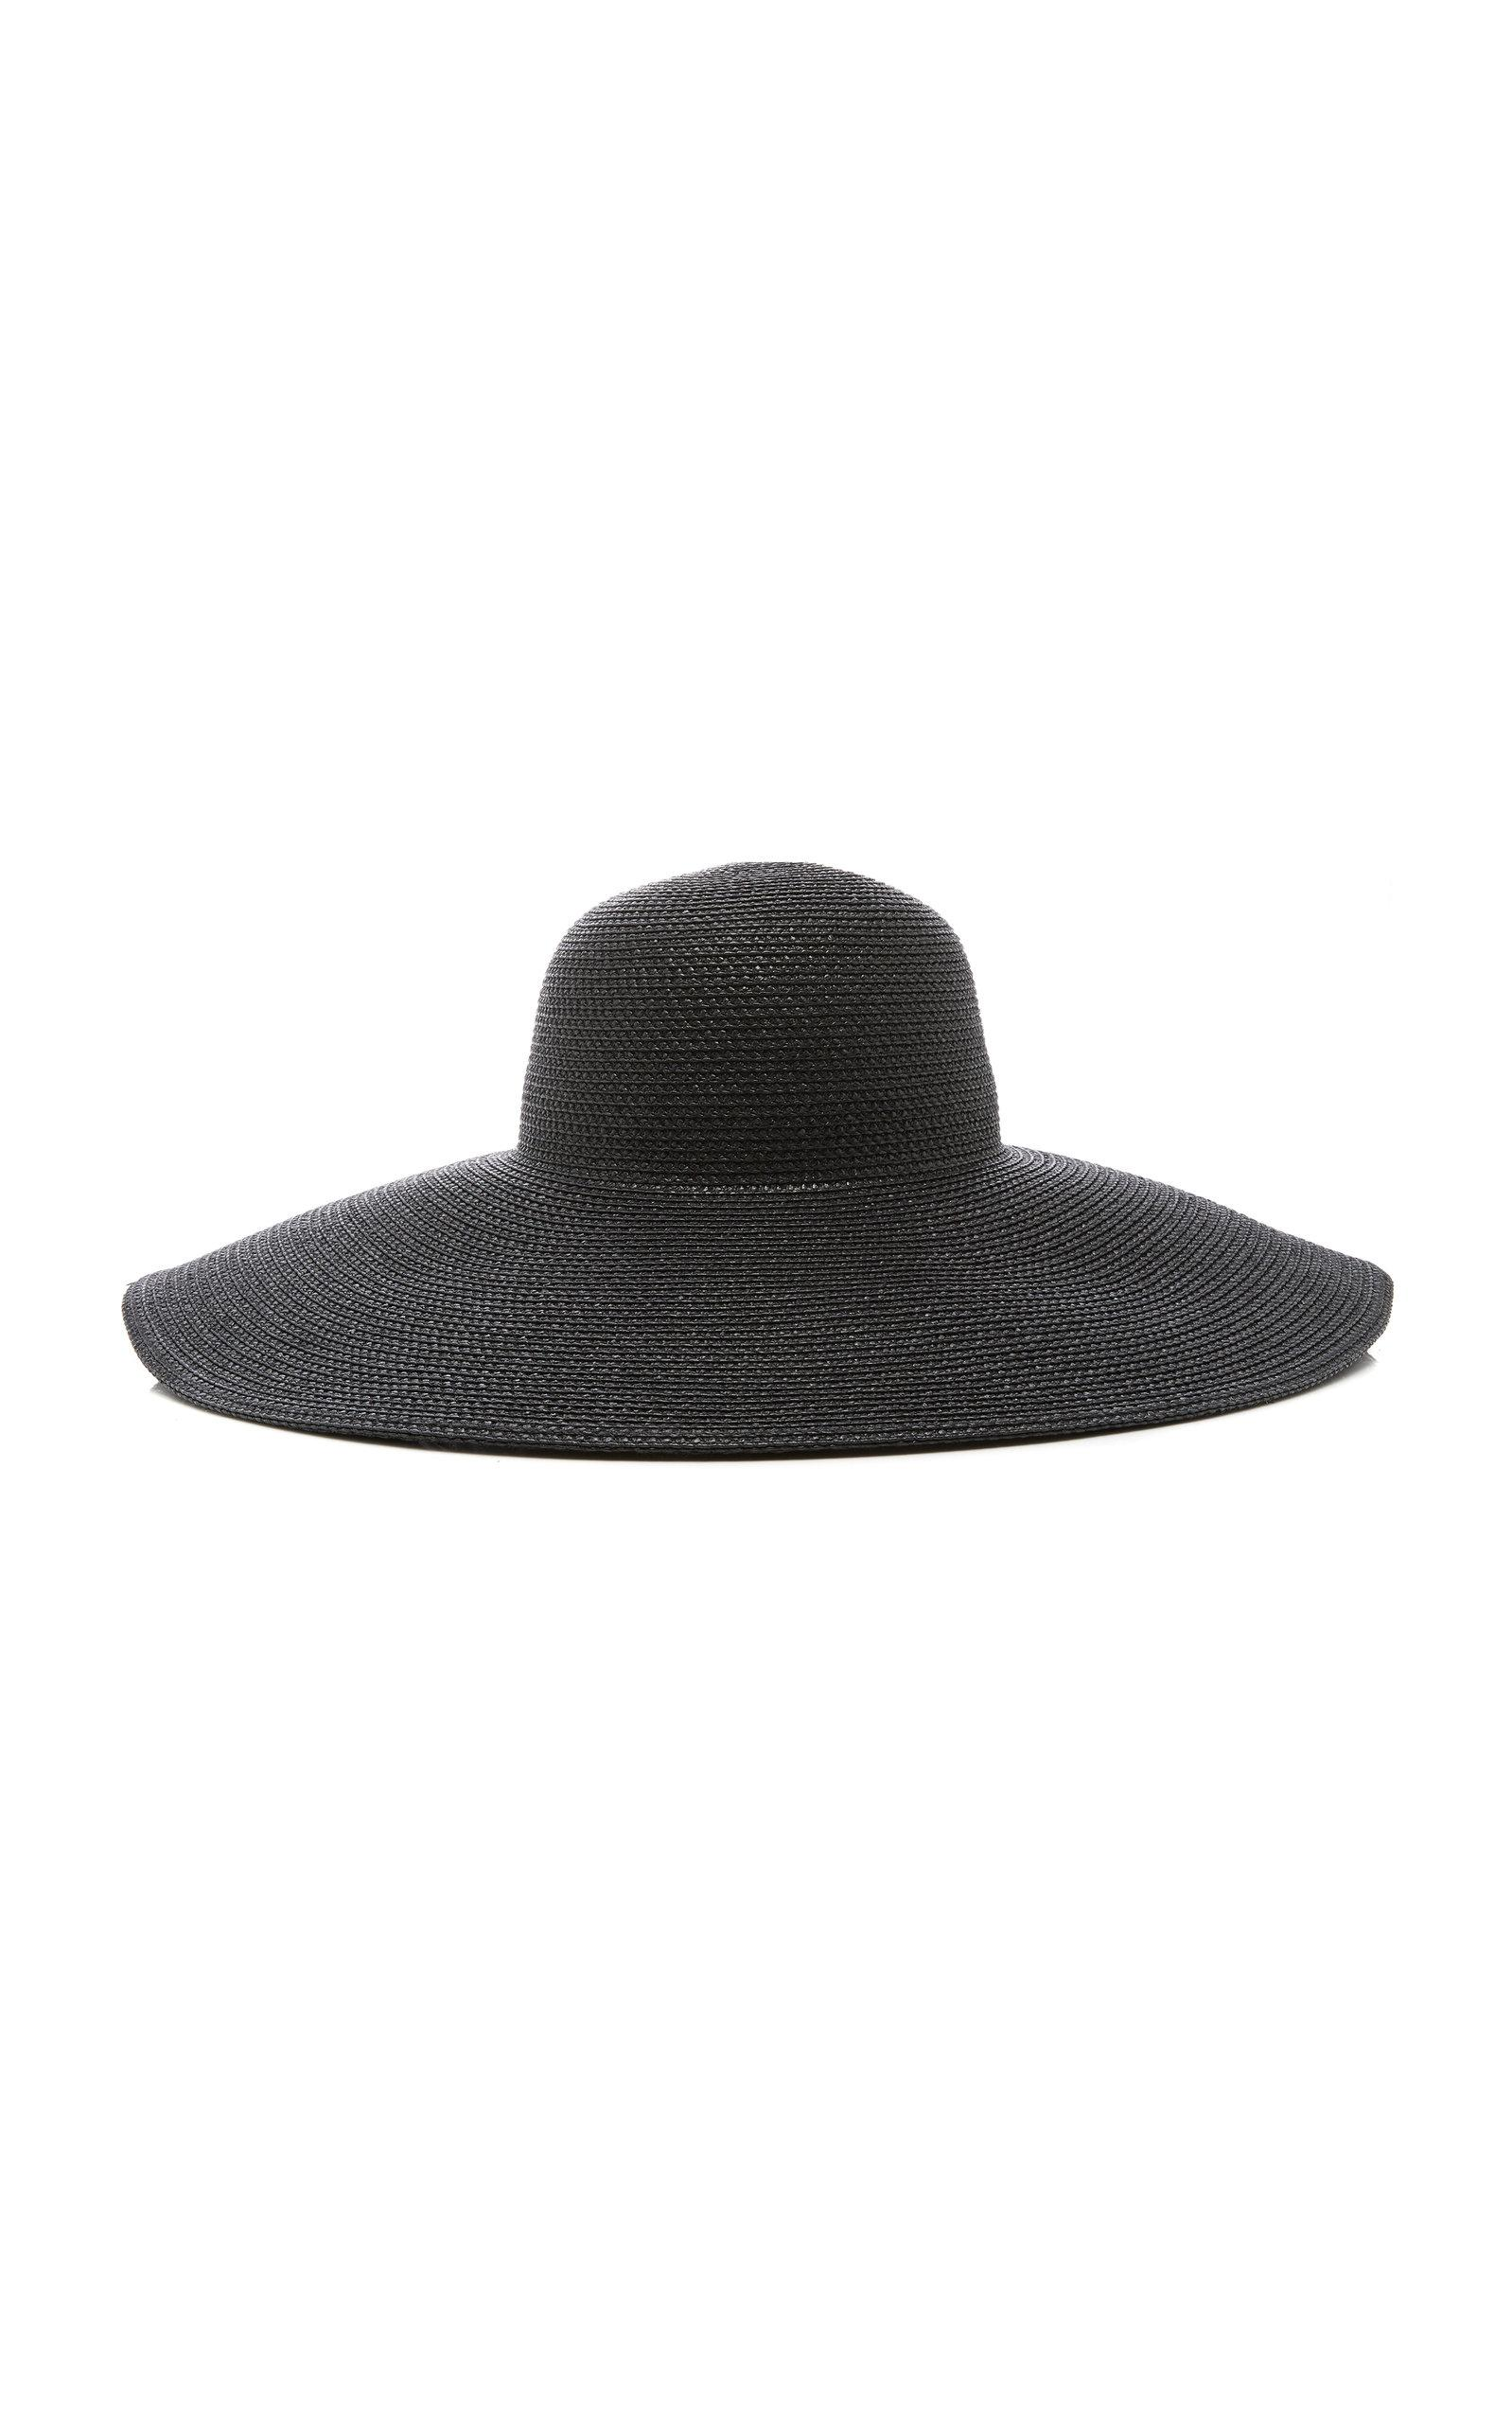 086ec33e324ec Lyst - Eric Javits Floppy Woven Sun Hat in Black